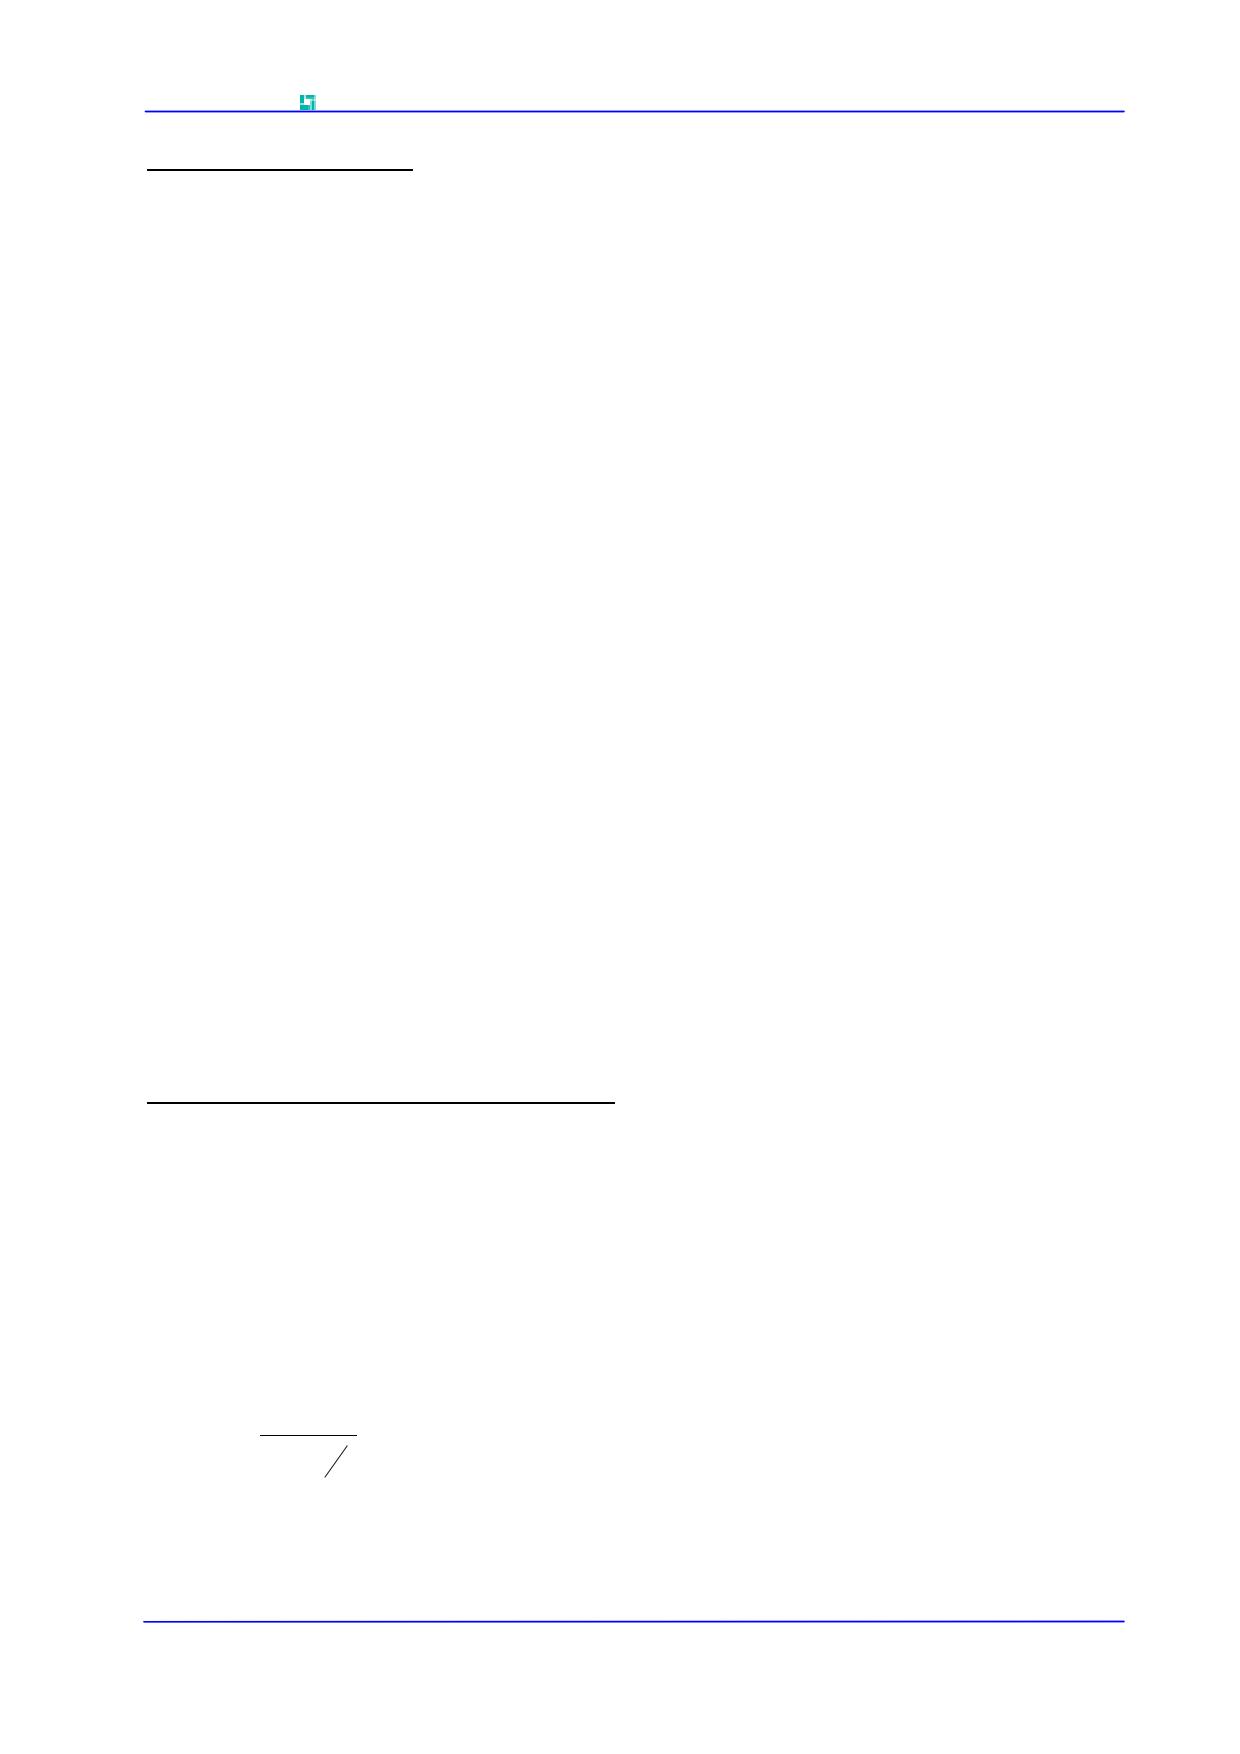 R0487YS14F pdf